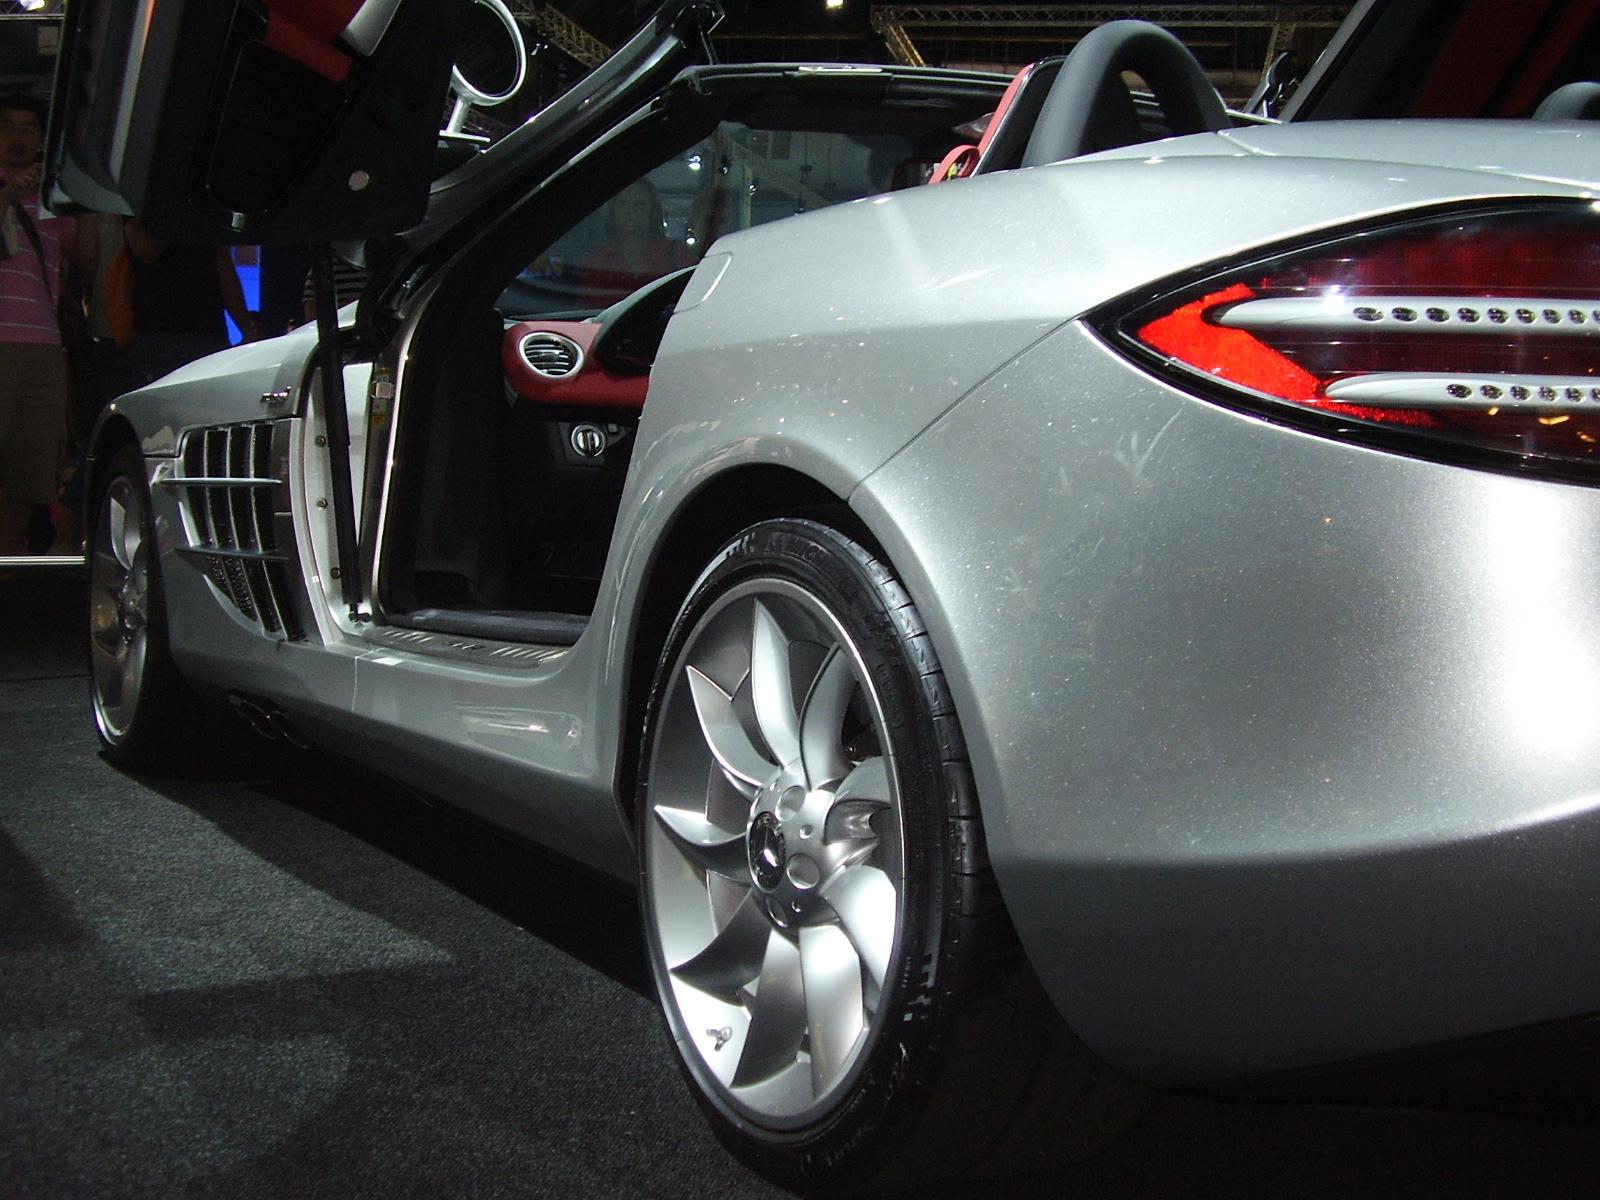 Visita Salon Automovil 09 BCN / Visit to Car Exhibition 09 Barcelona-P5140727.JPG